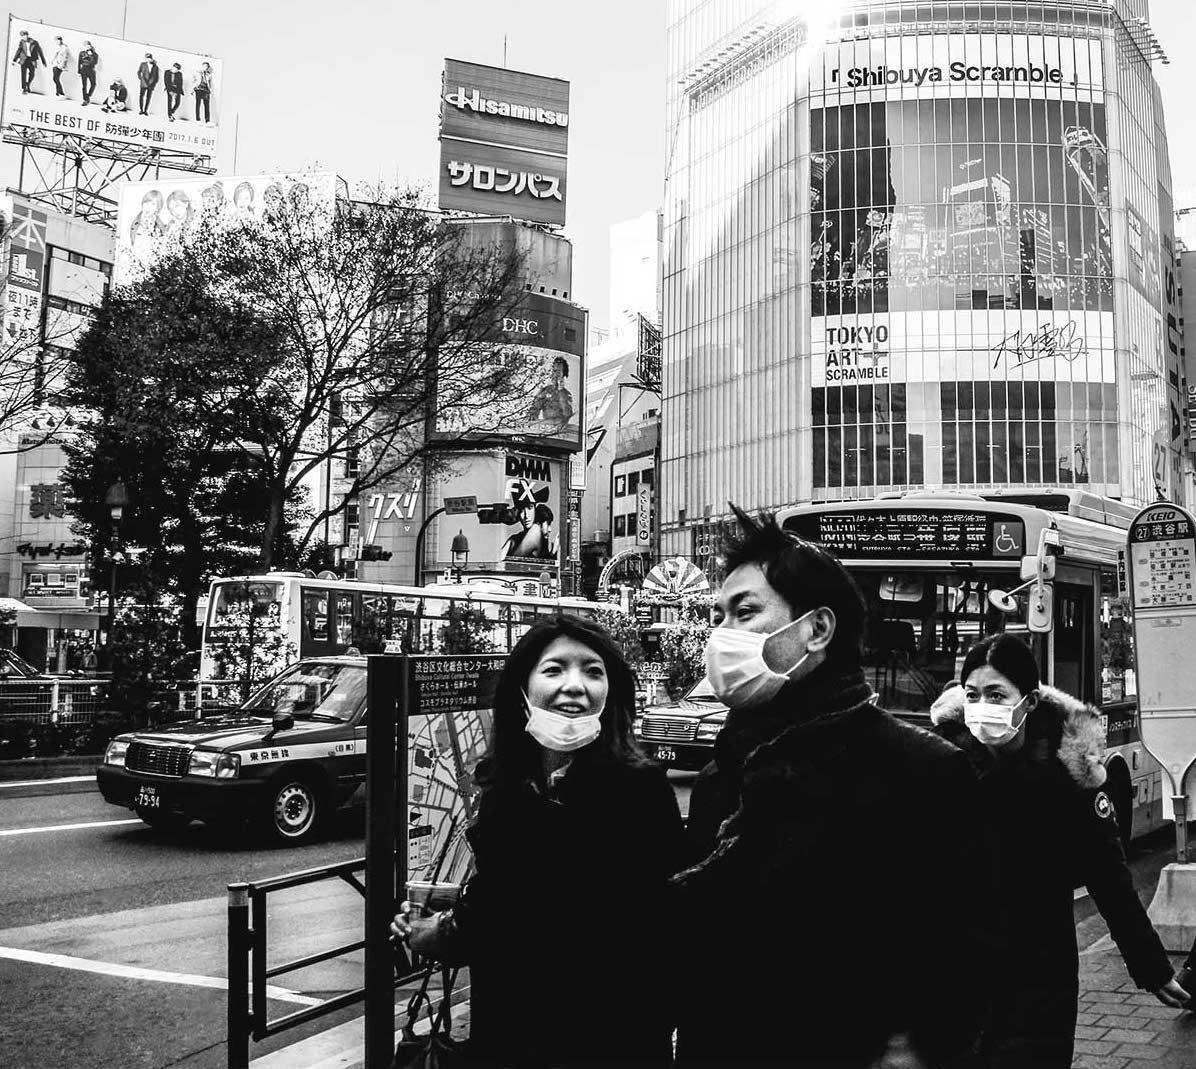 Tokyo street photography: Man and two women near the Shibuya scramble crossing in Tokyo, Japan. © 2016 Muntaka Chasant